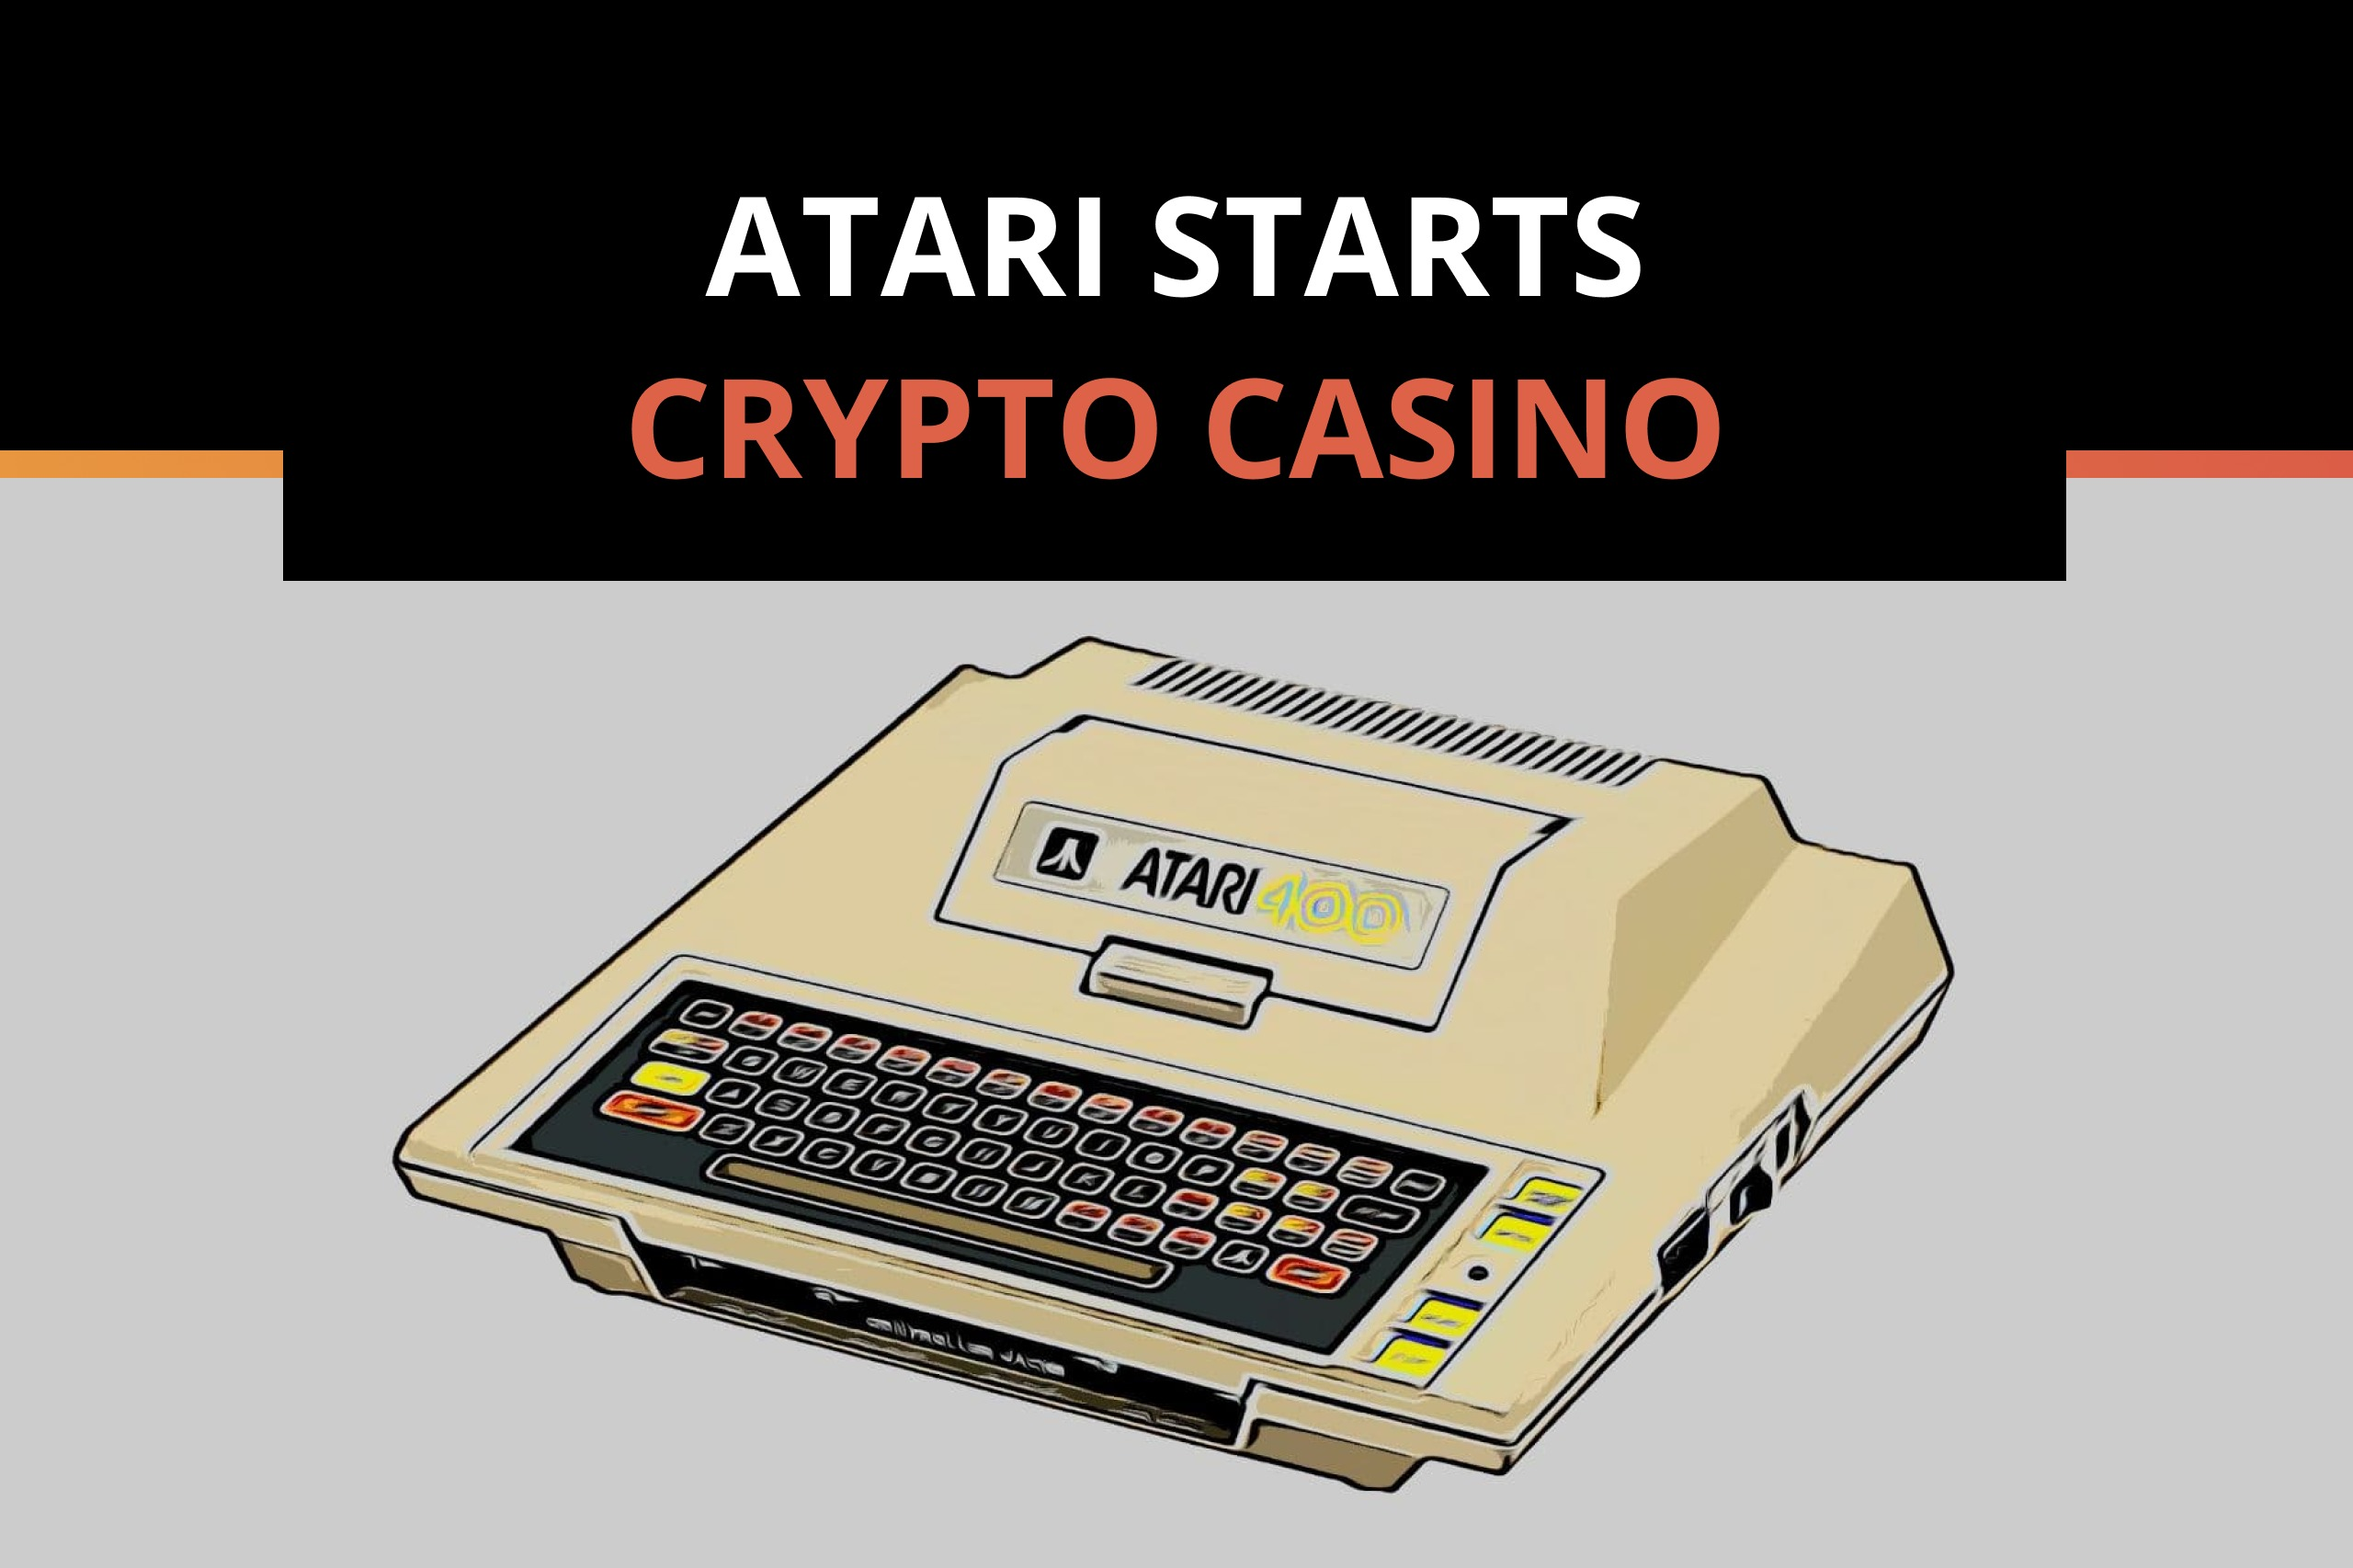 Atari Starts Crypto Casino